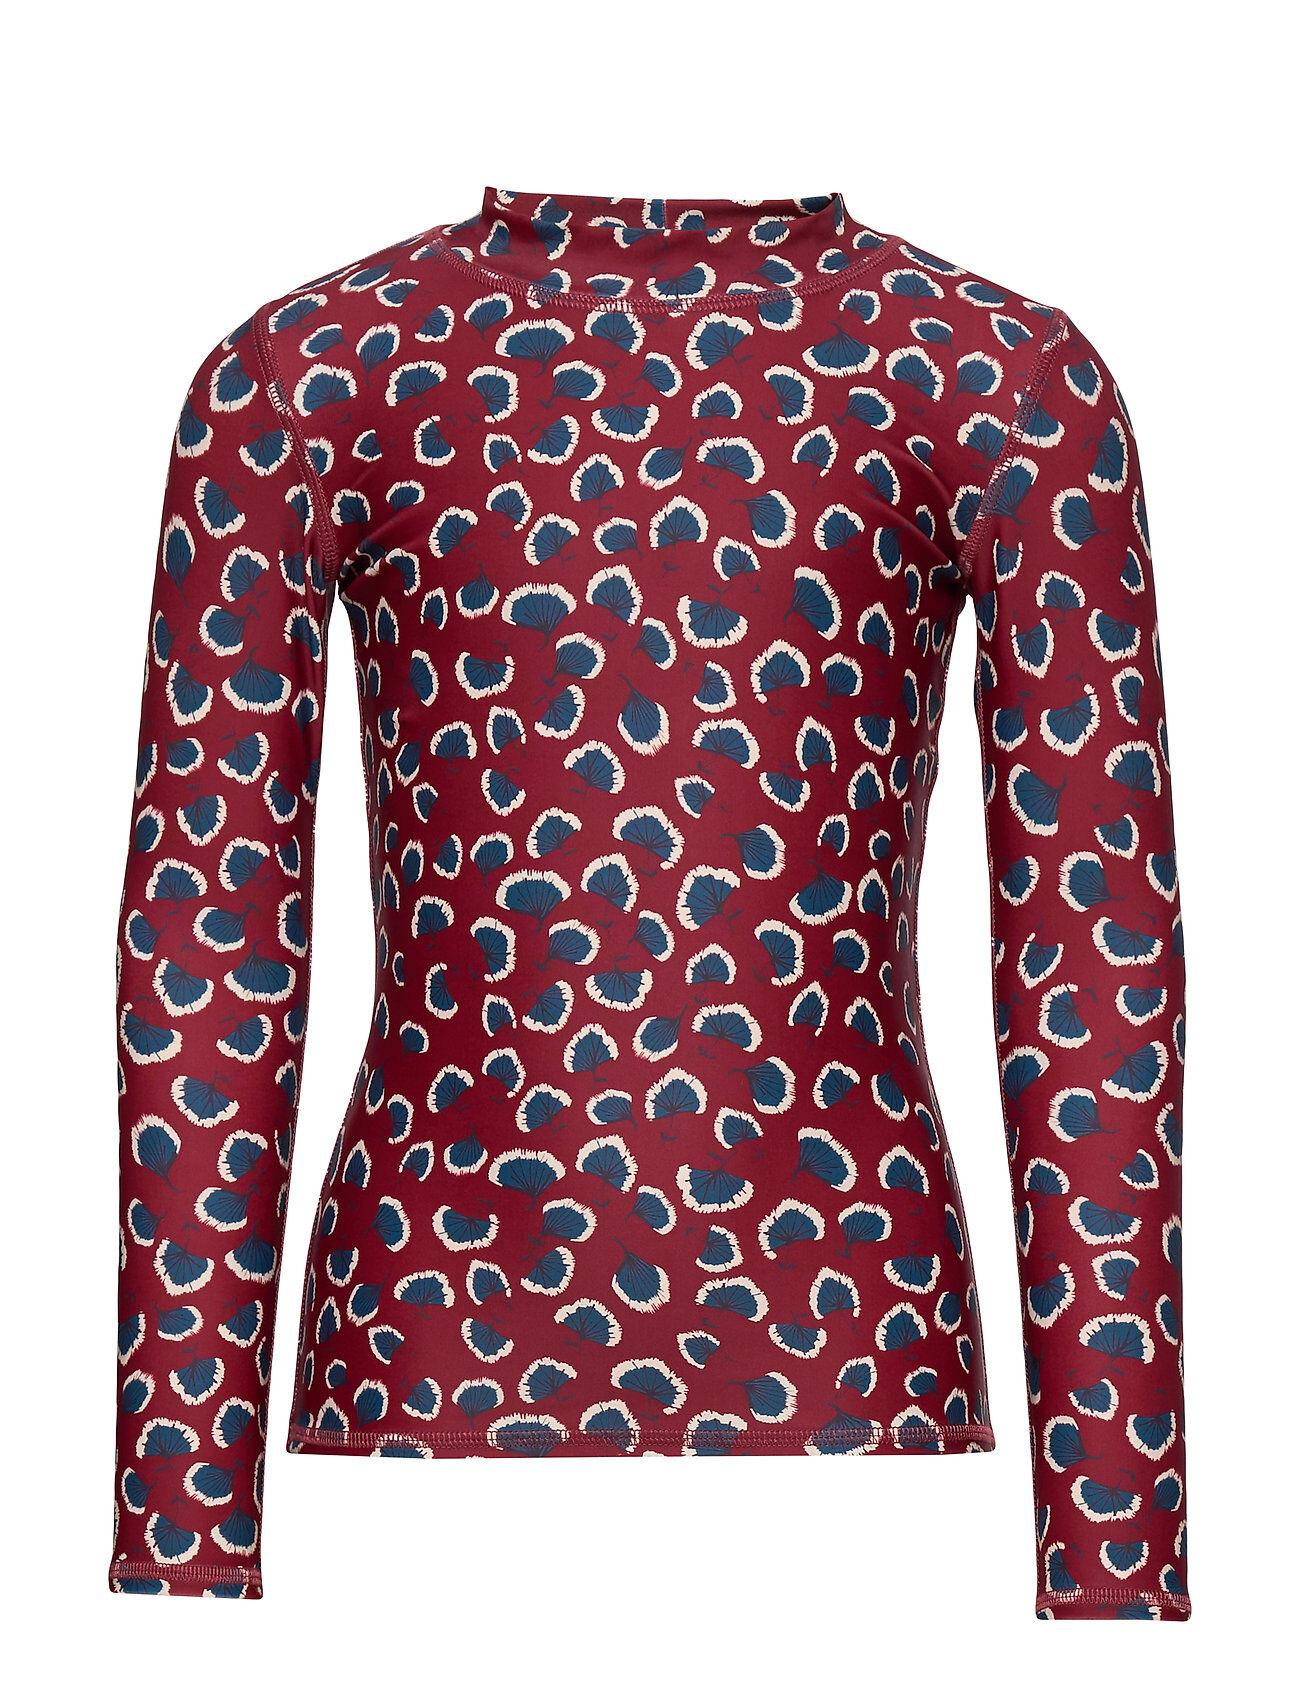 Image of Soft Gallery Astin Sun Shirt Swimwear UV Clothing UV Tops Punainen Soft Gallery